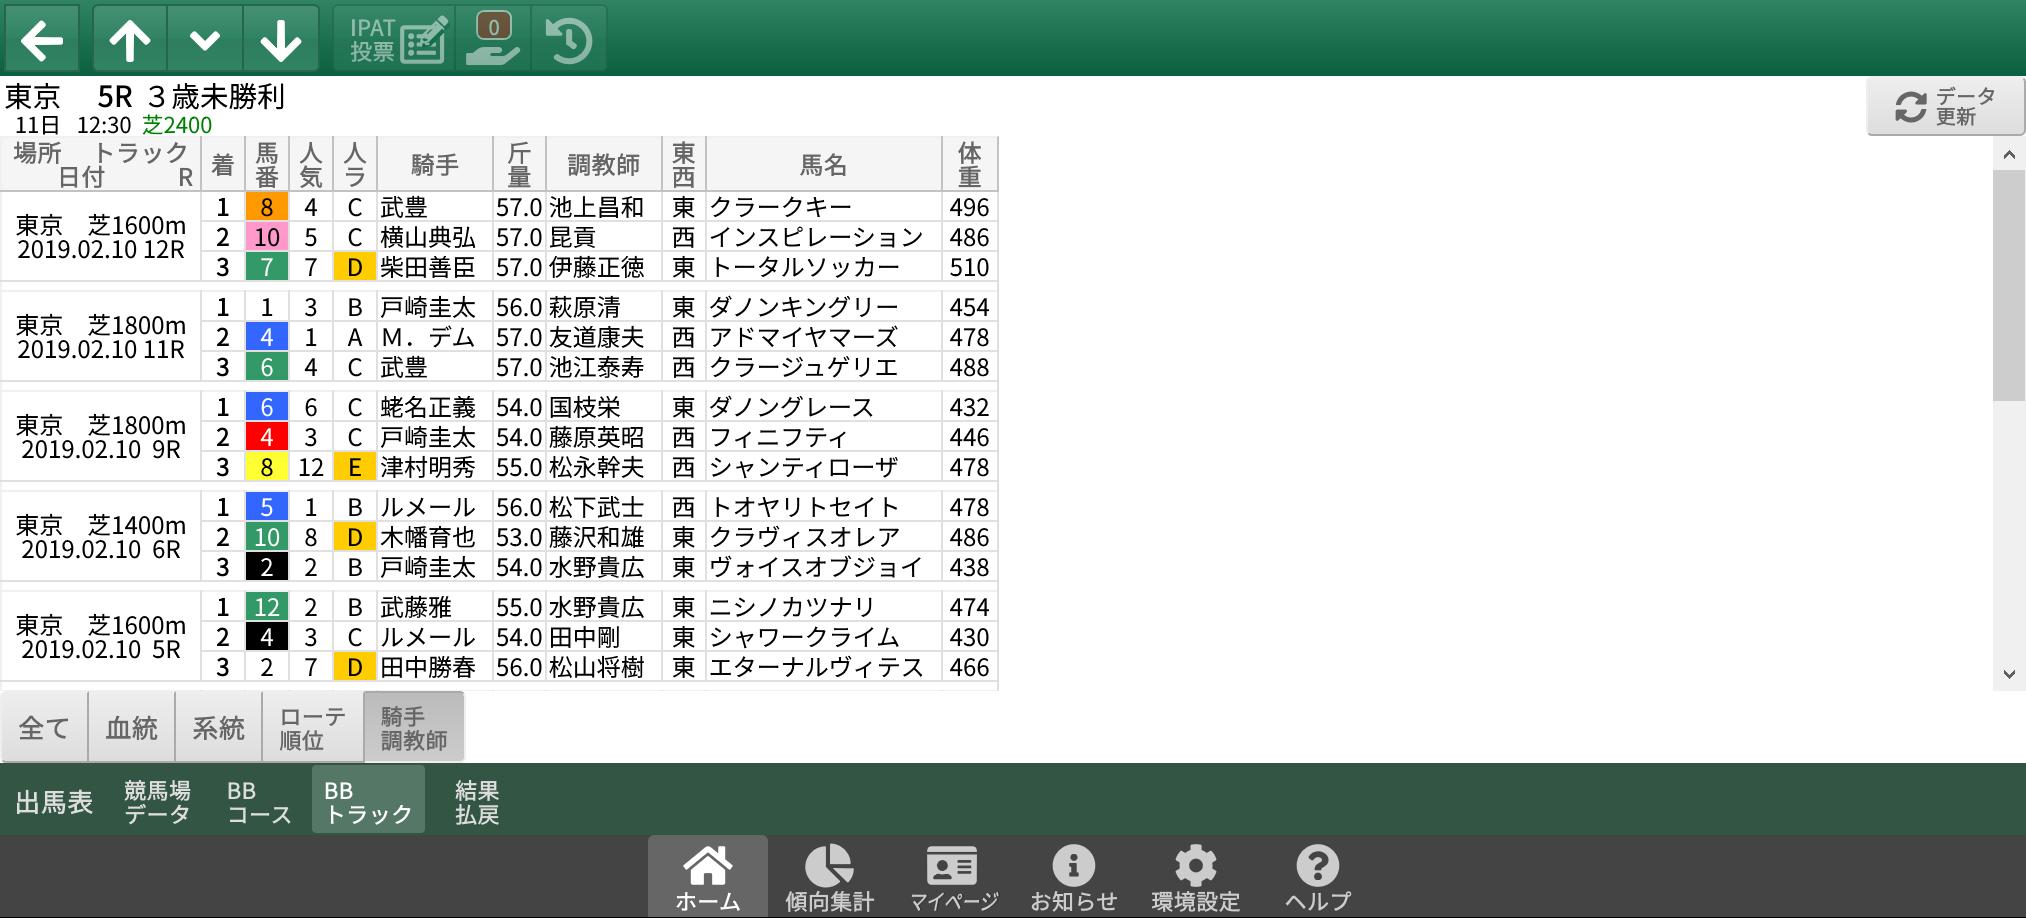 2/10(日)東京競馬 1~3着内好走馬の傾向(血統・系統・ローテ・パターン・騎手・調教師)